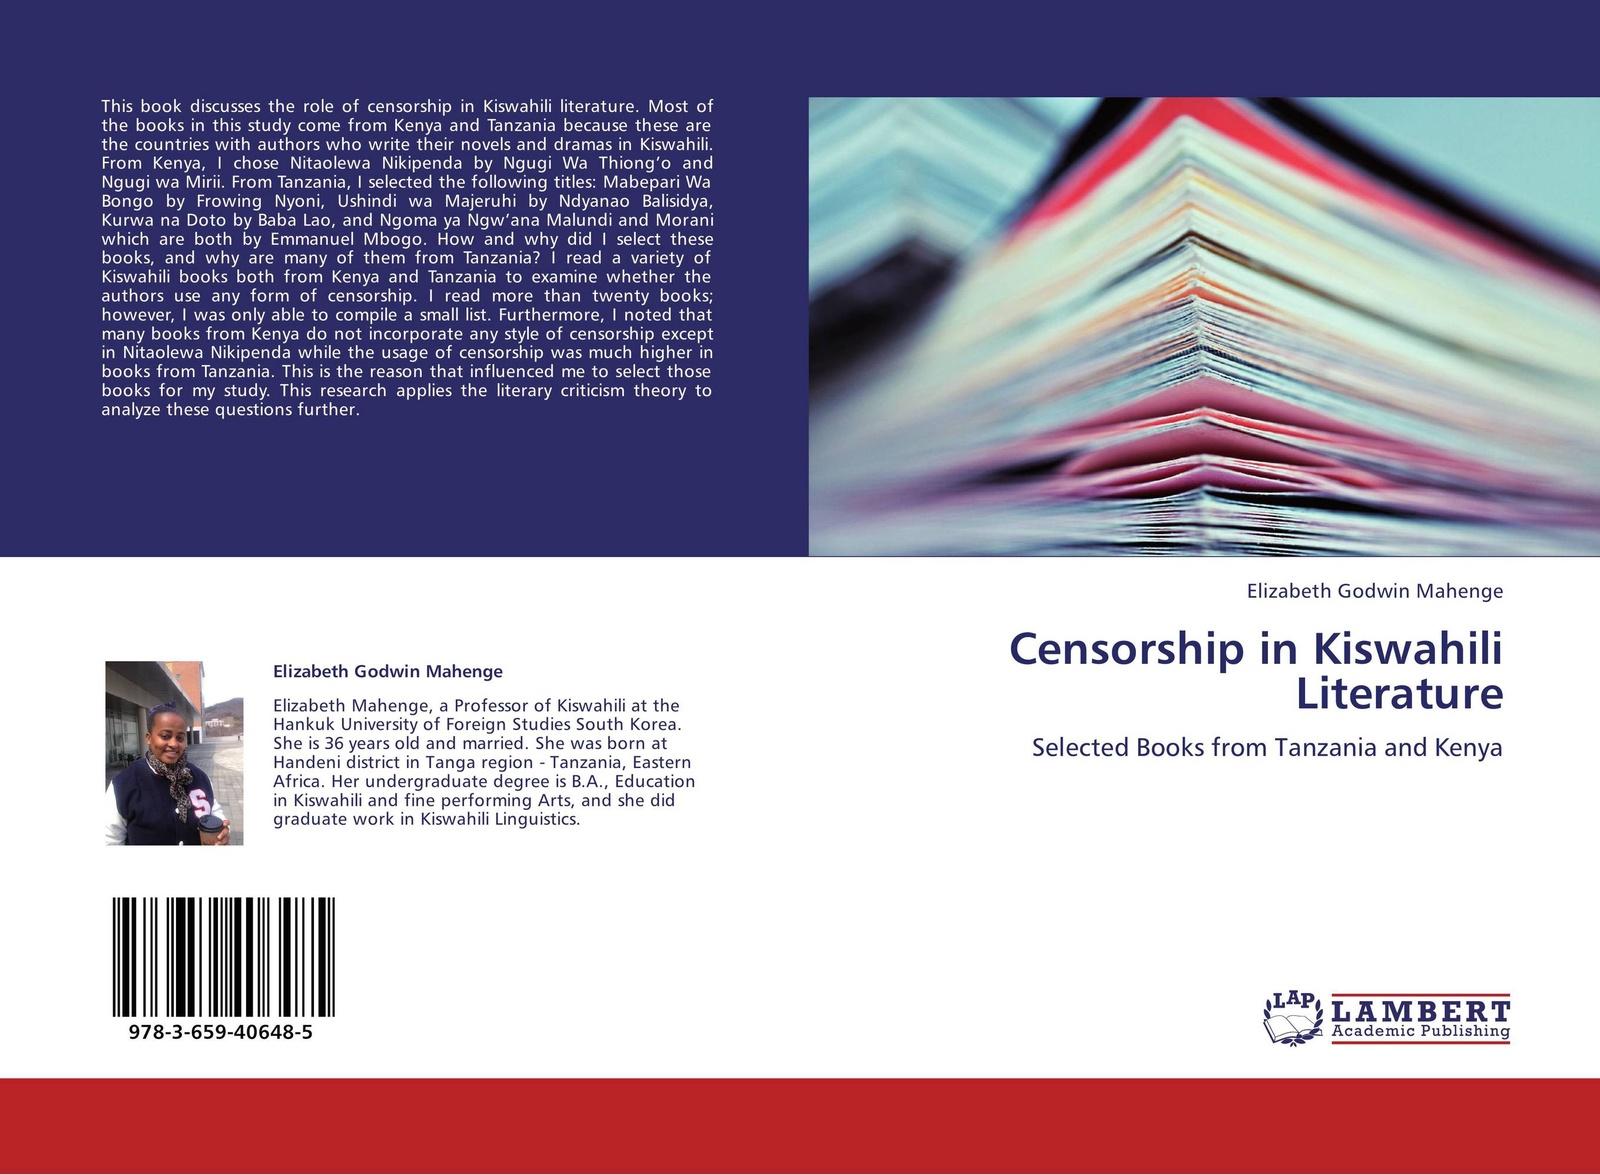 Elizabeth Godwin Mahenge Censorship in Kiswahili Literature union day tanzania gifts